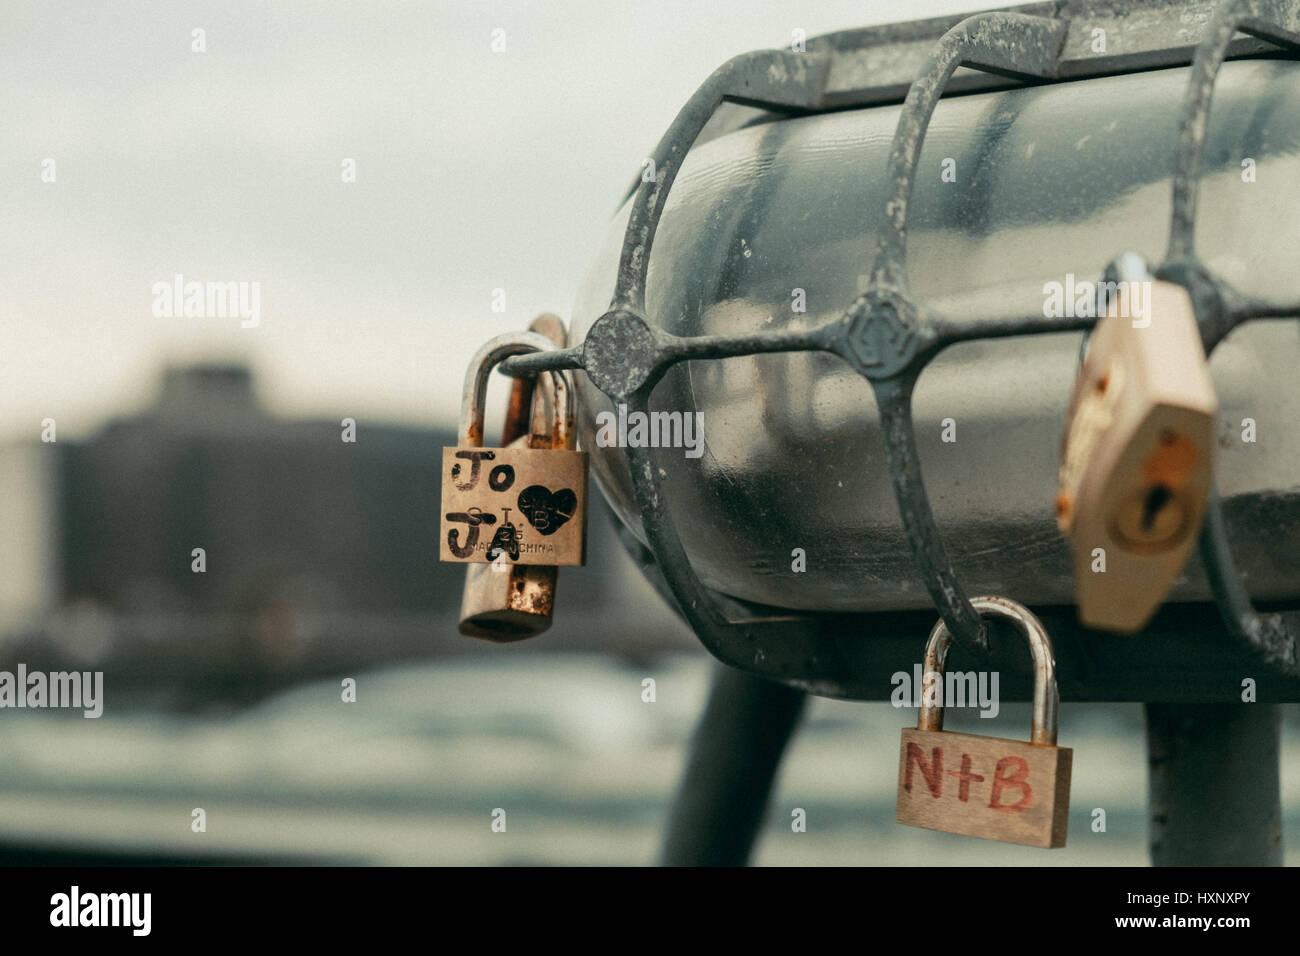 Love locks - Stock Image